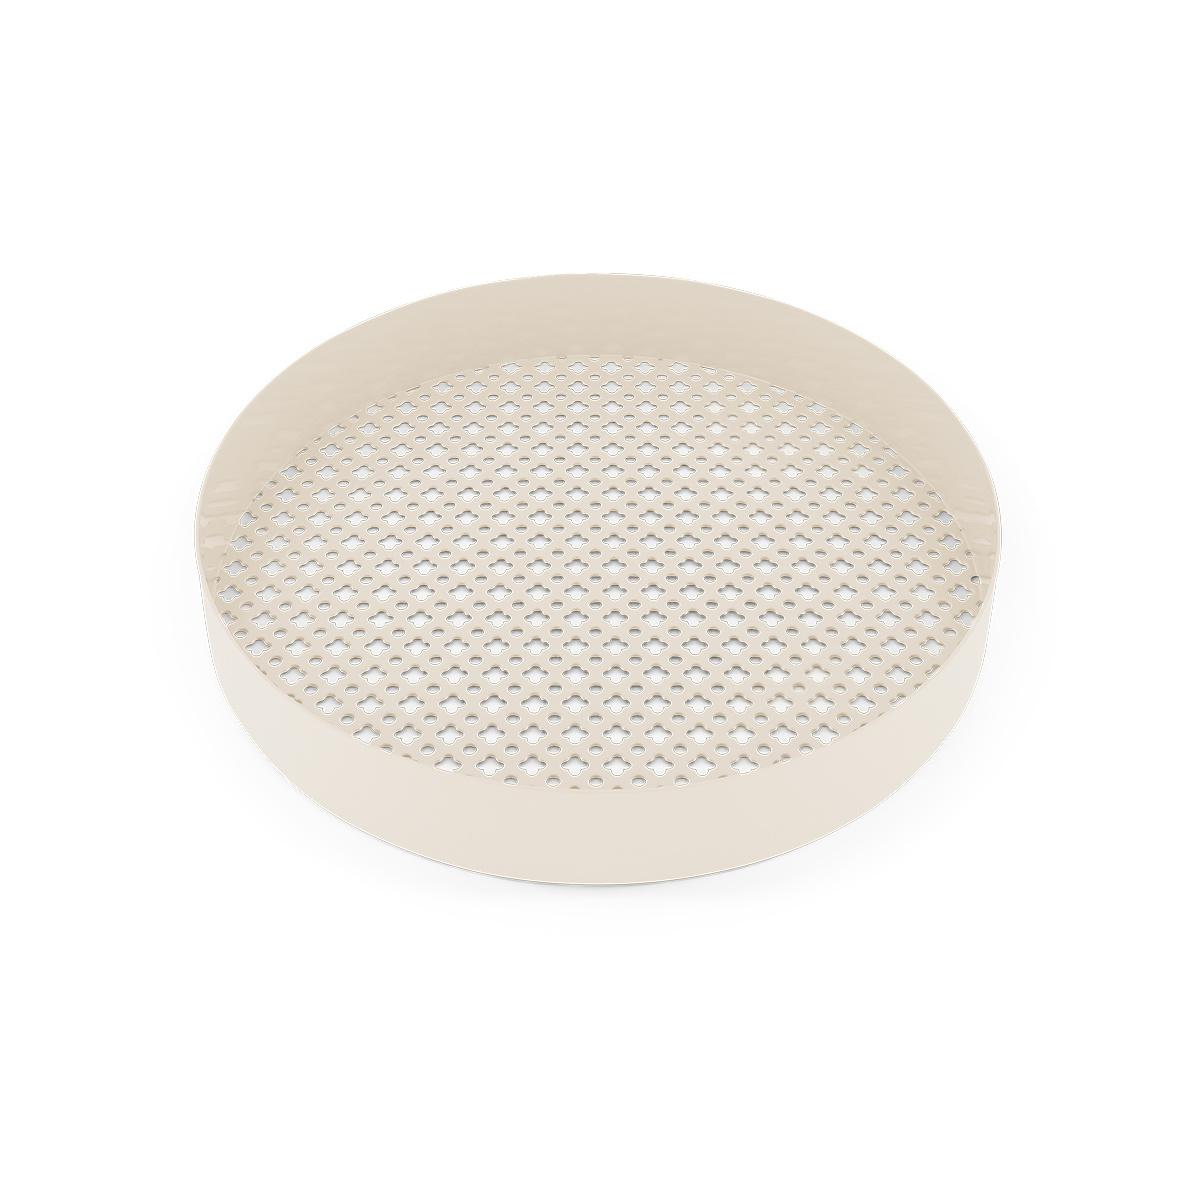 Matteo cream white platter